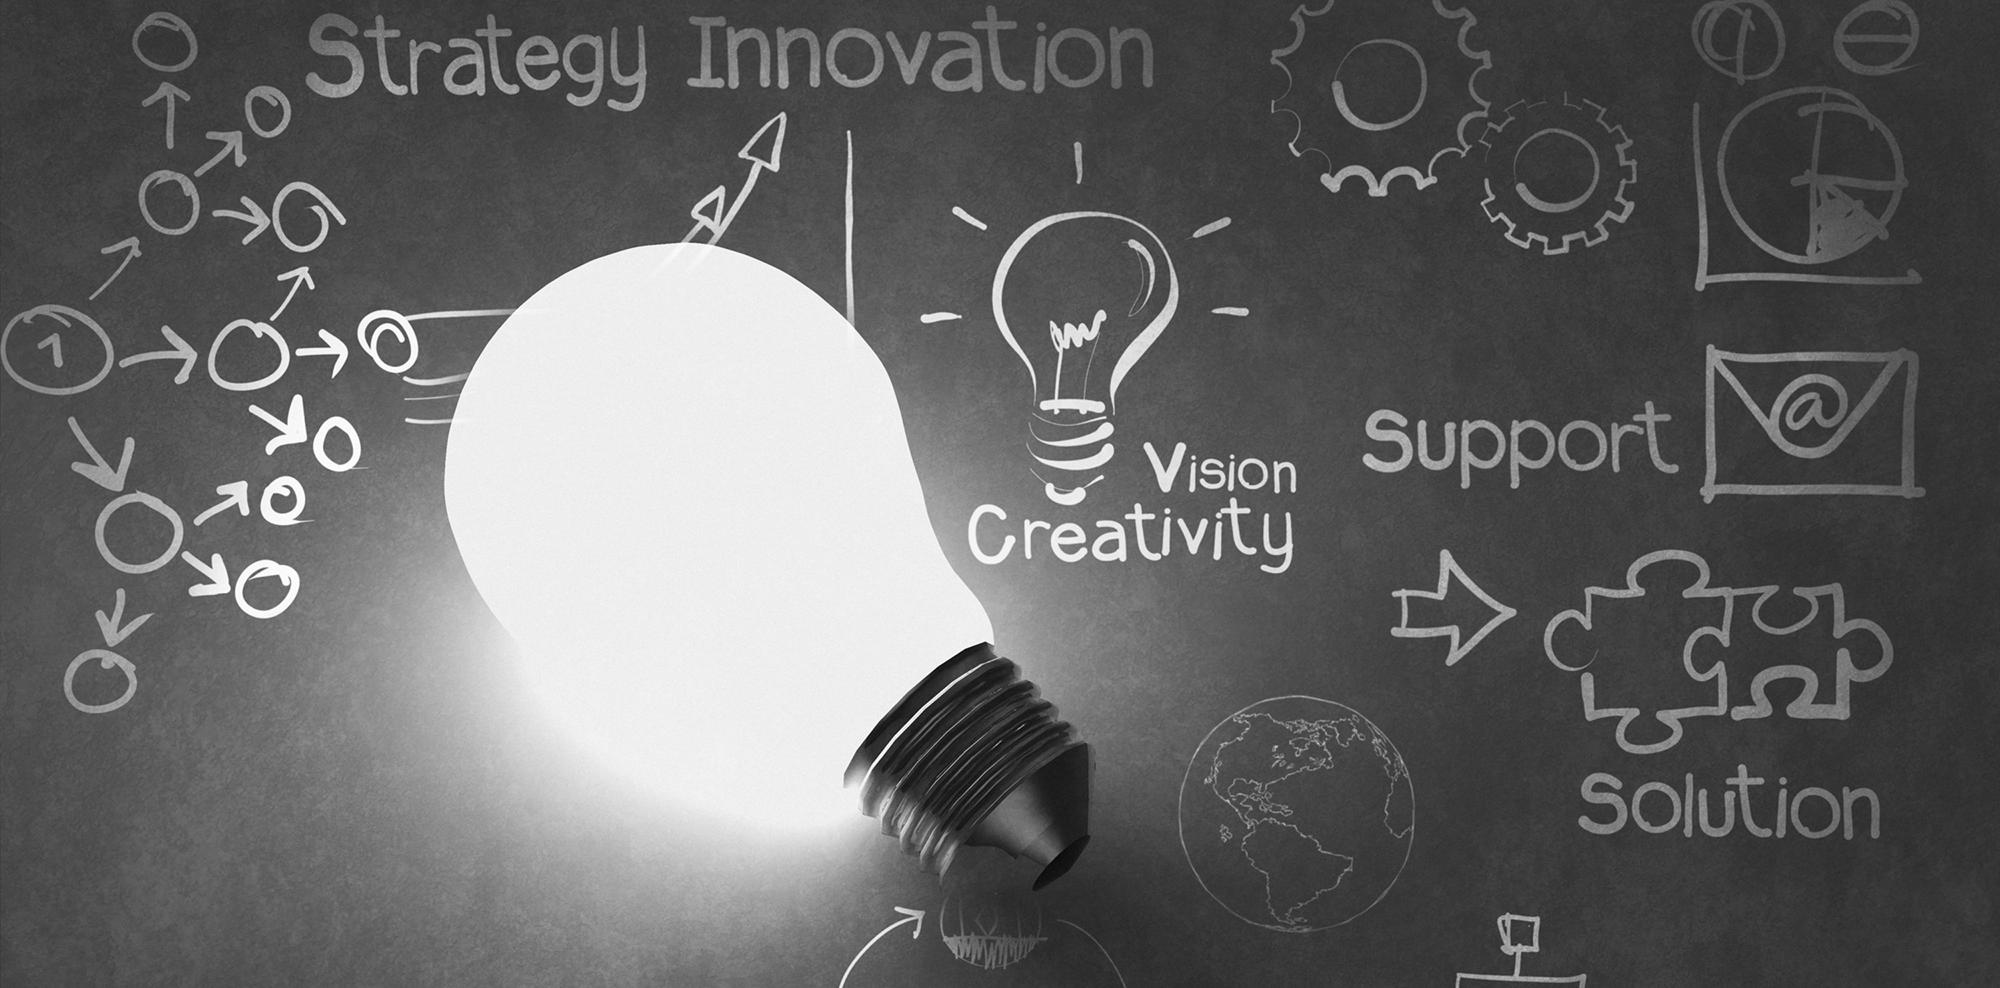 innovation-light-bulb-hero-stock-image-2000px.png